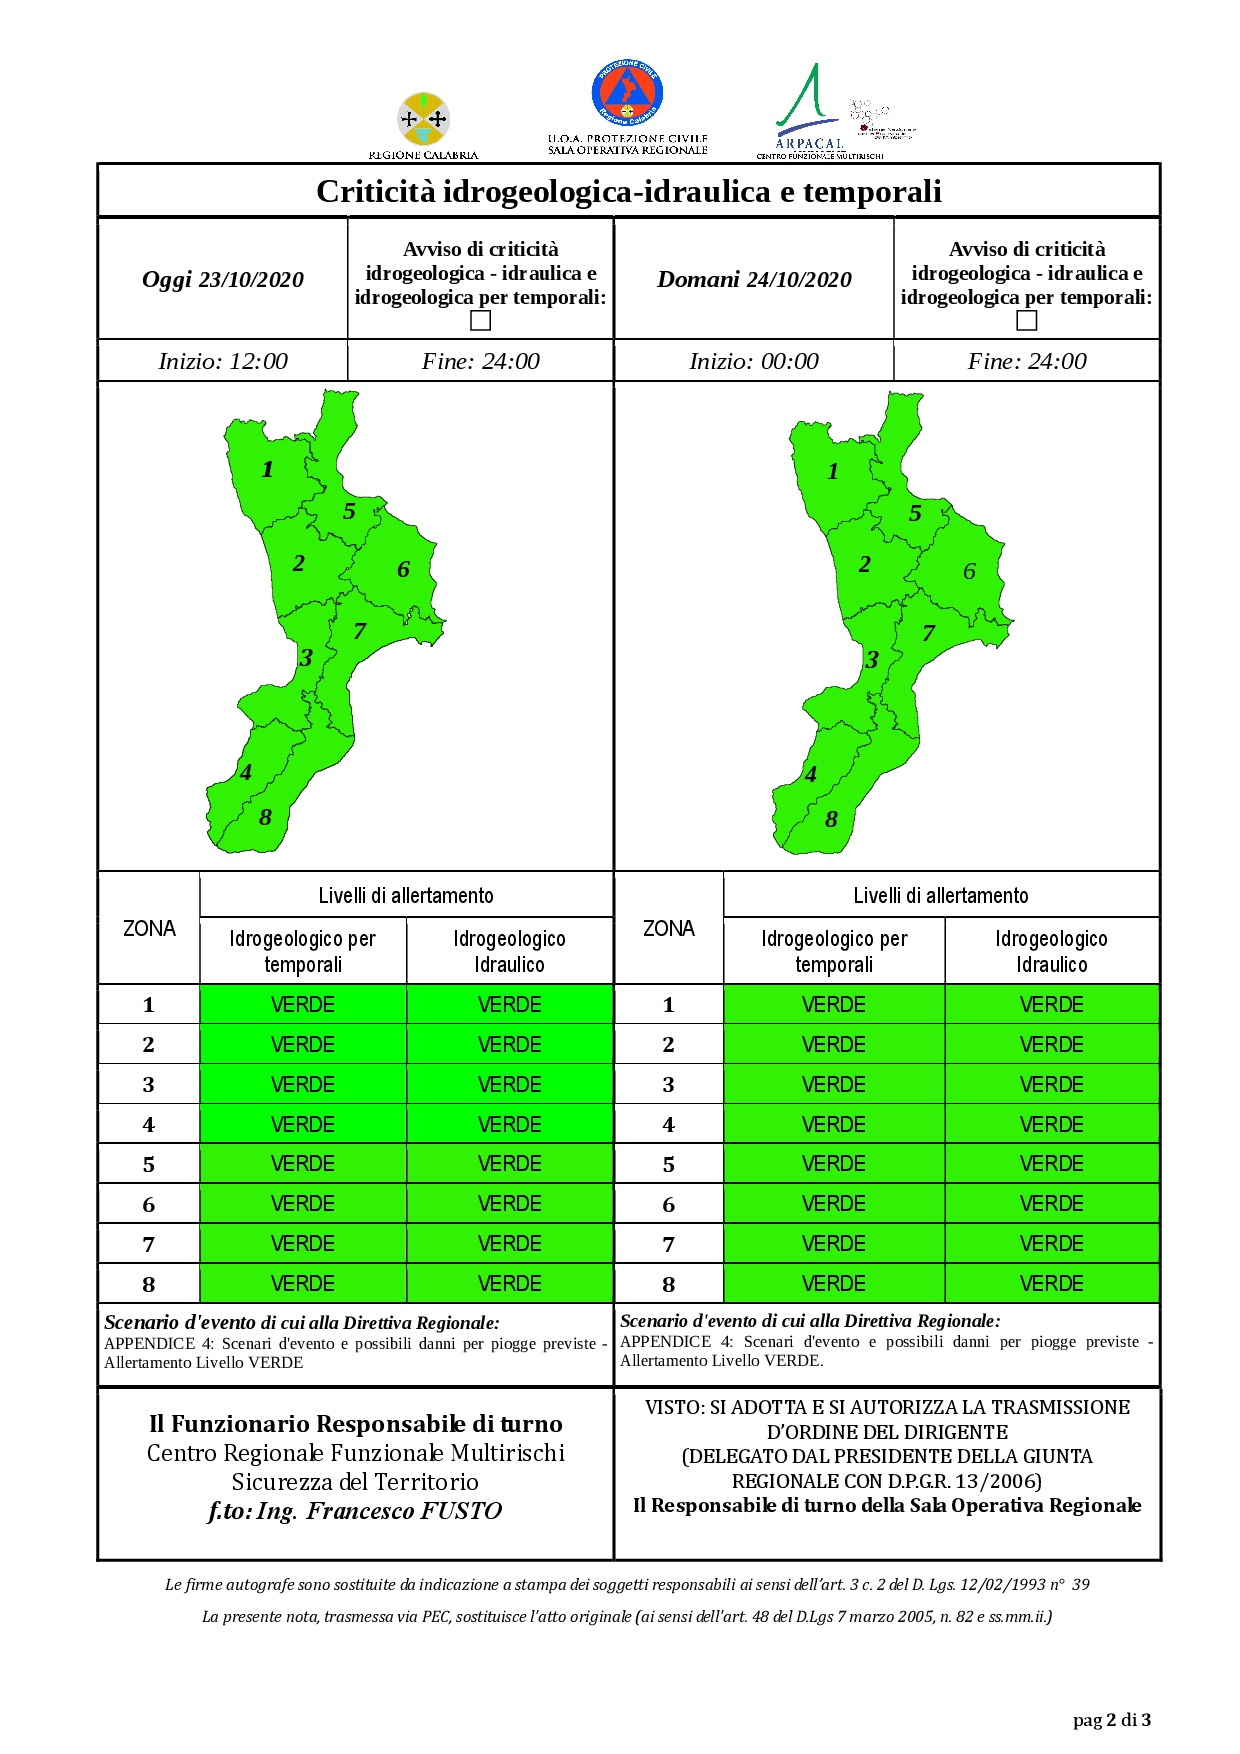 Criticità idrogeologica-idraulica e temporali in Calabria 23-10-2020